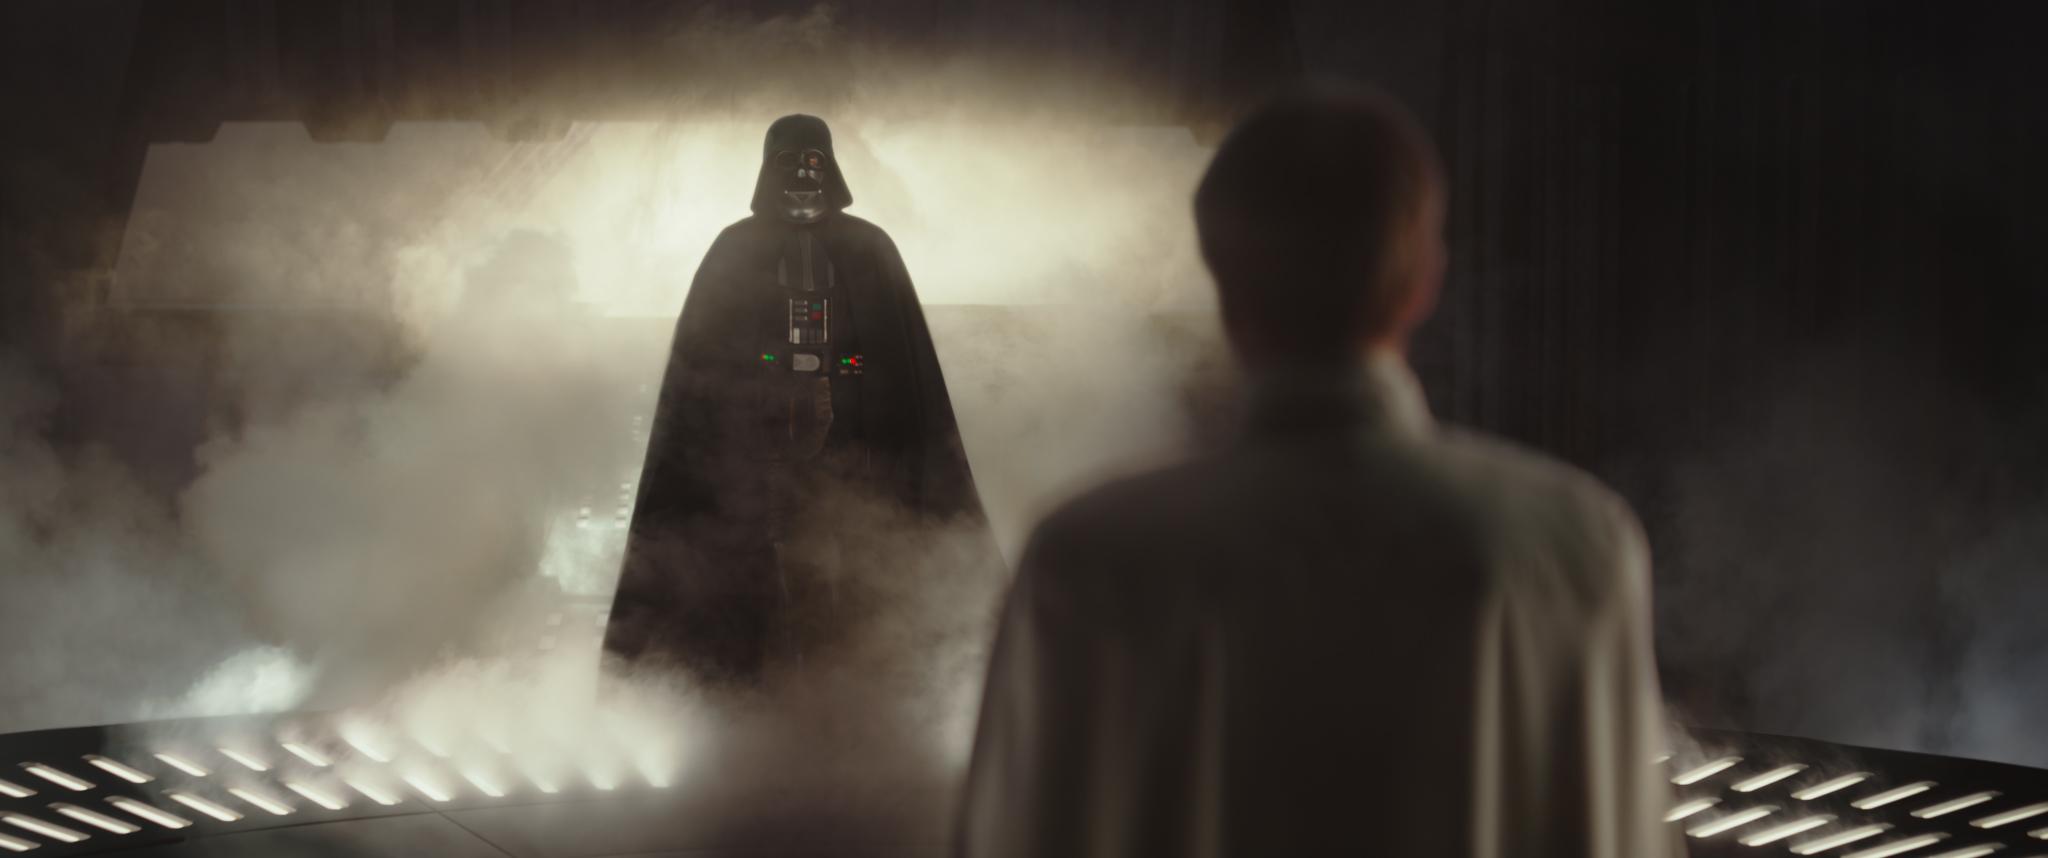 Bild: Lucasfilm/ILM..©2016 Lucasfilm Ltd. All Rights Reserved.